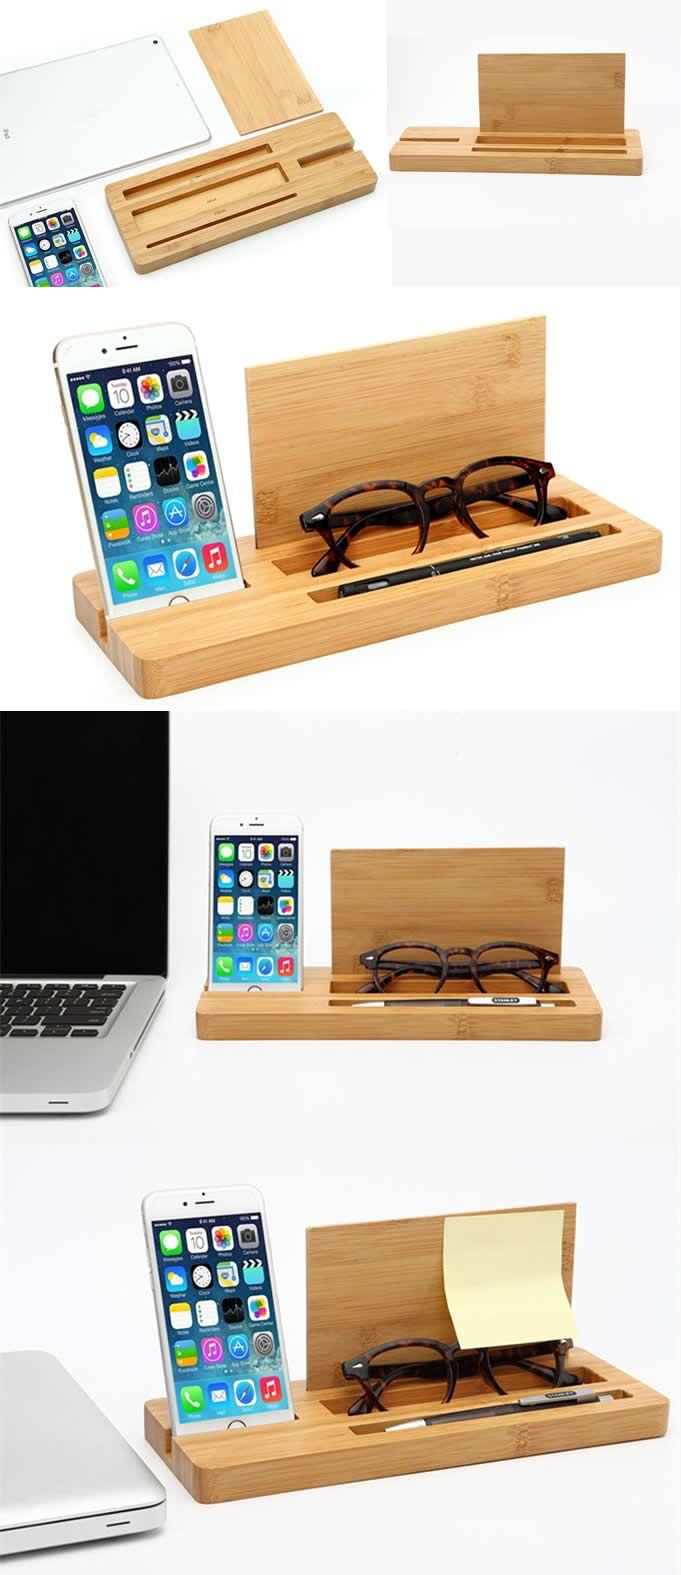 Bamboo Wooden Stationery Office Desk Organizer Glasses Sunglasses Eyeglass Holder Clipboard Docume Desk Organization Desk Organization Office Desk Phone Holder